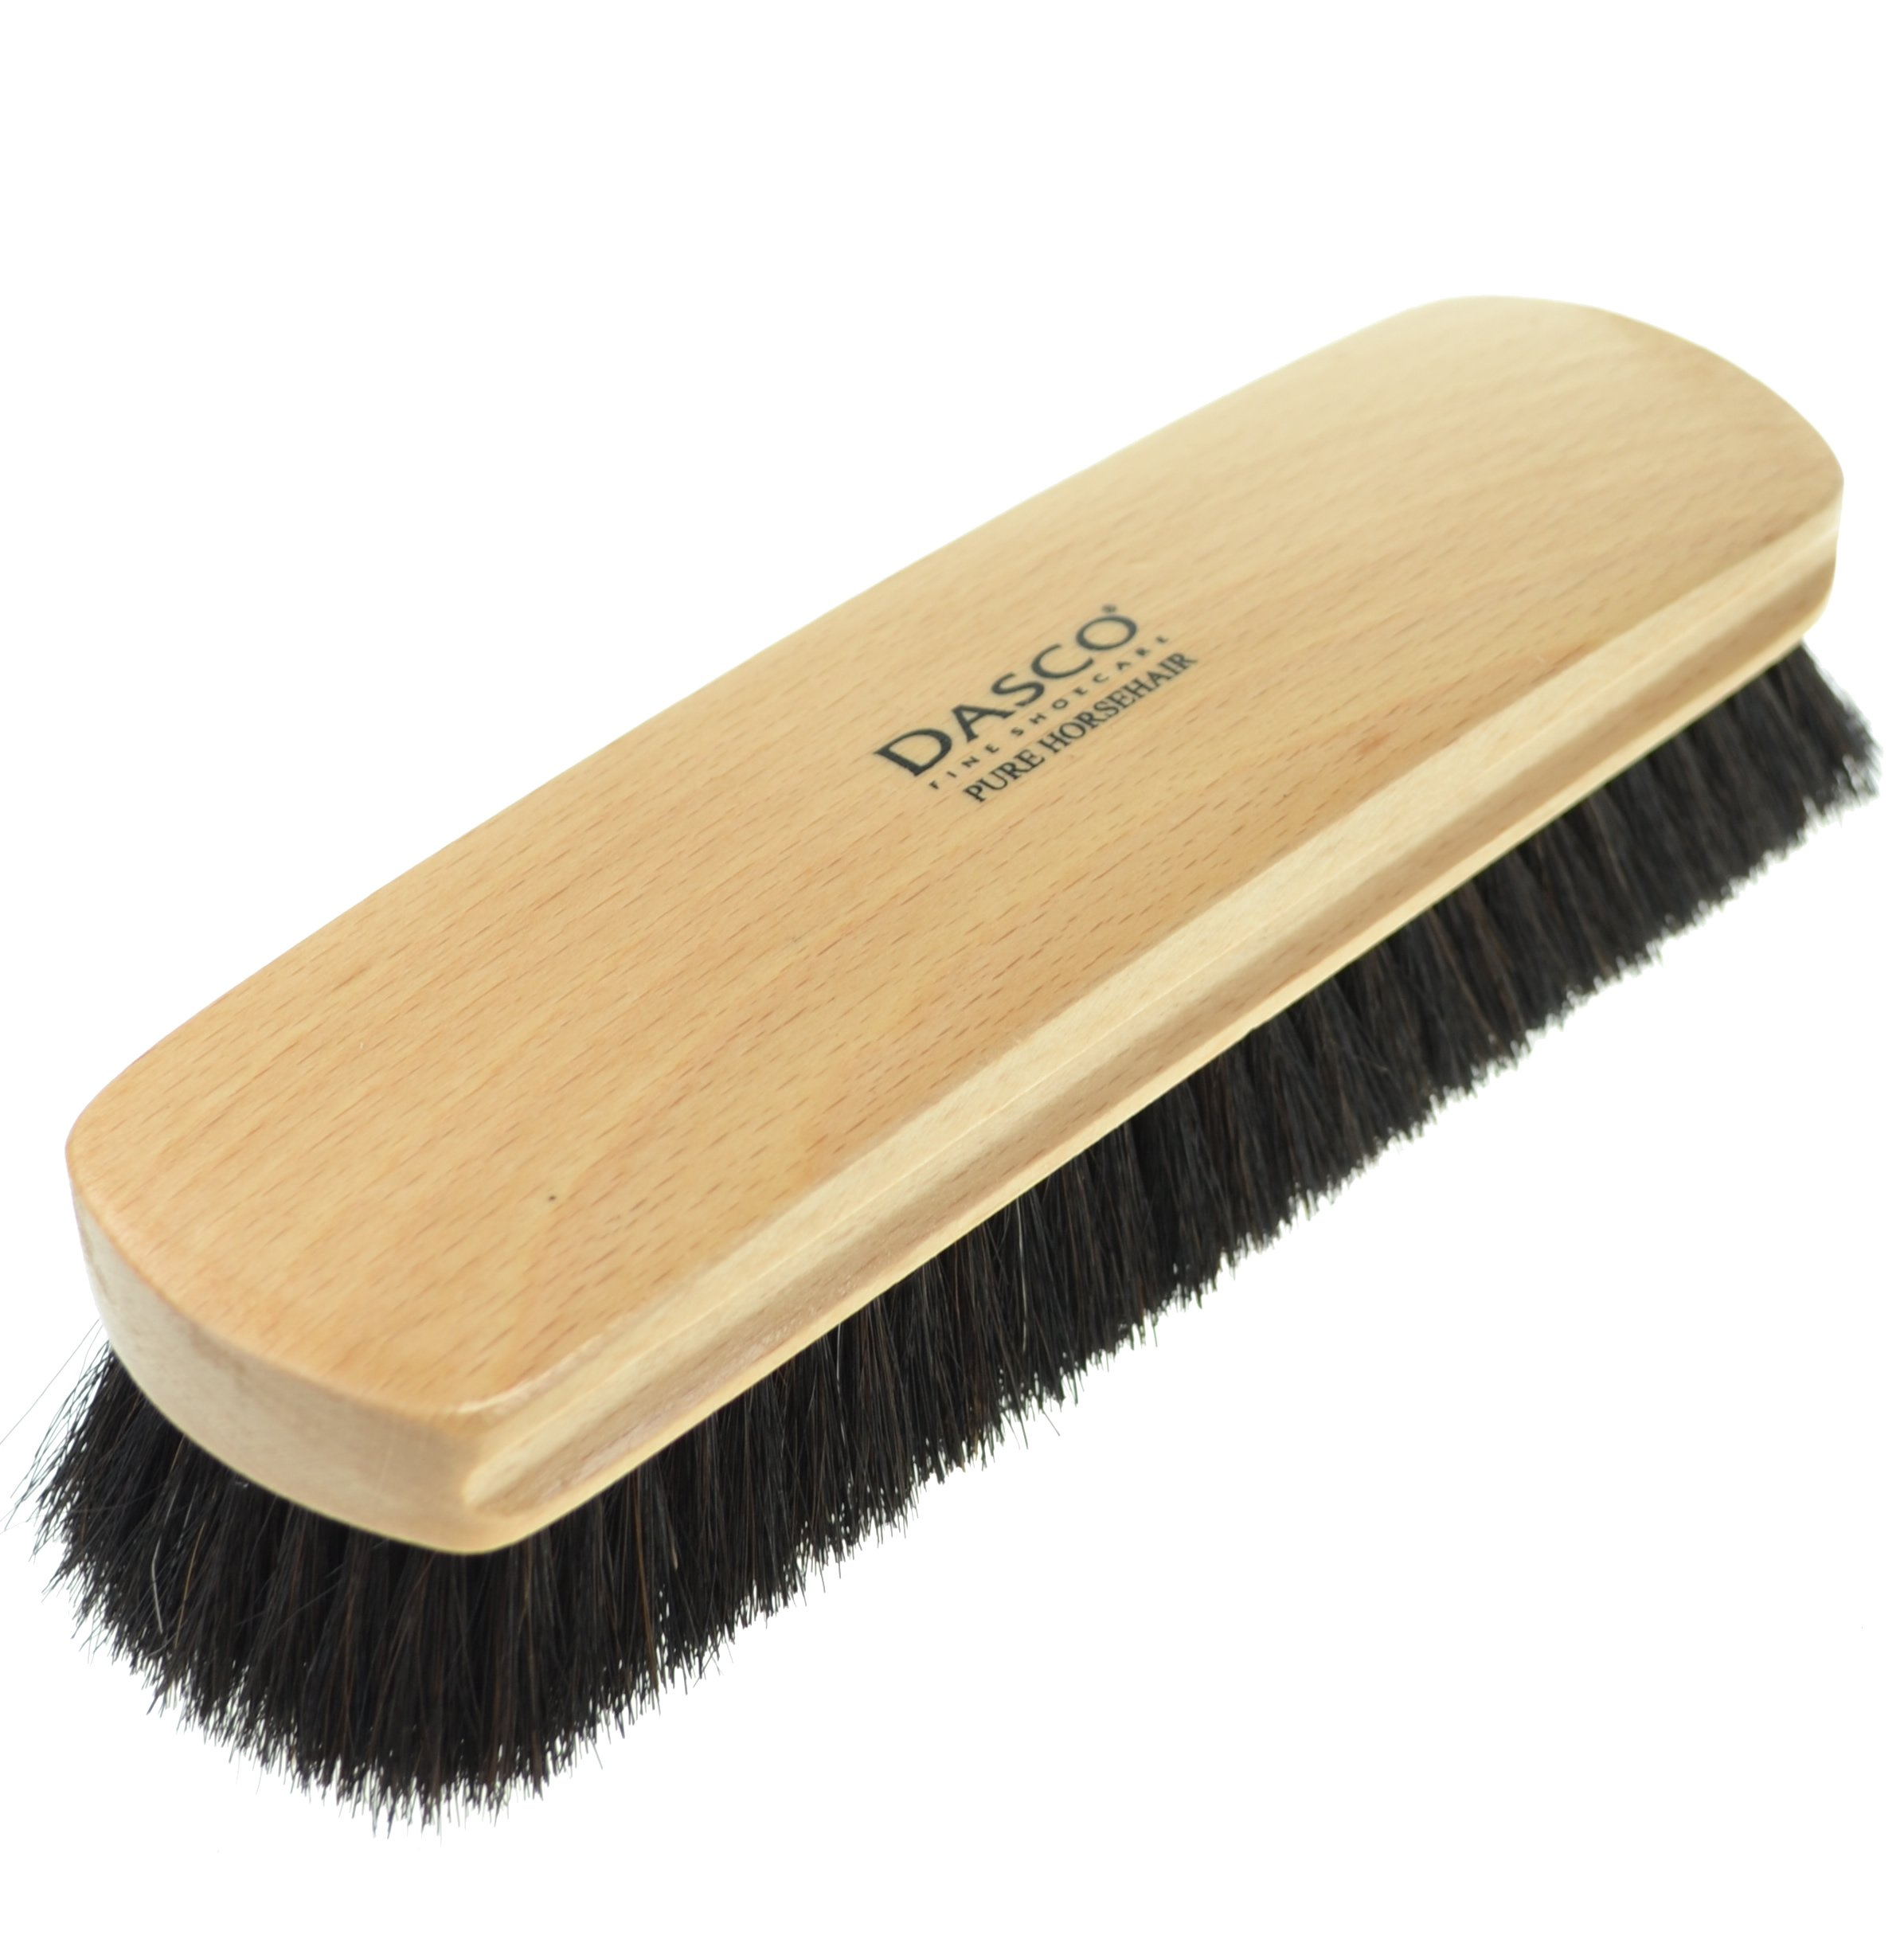 Dasco Shoes in Horsehair Brush